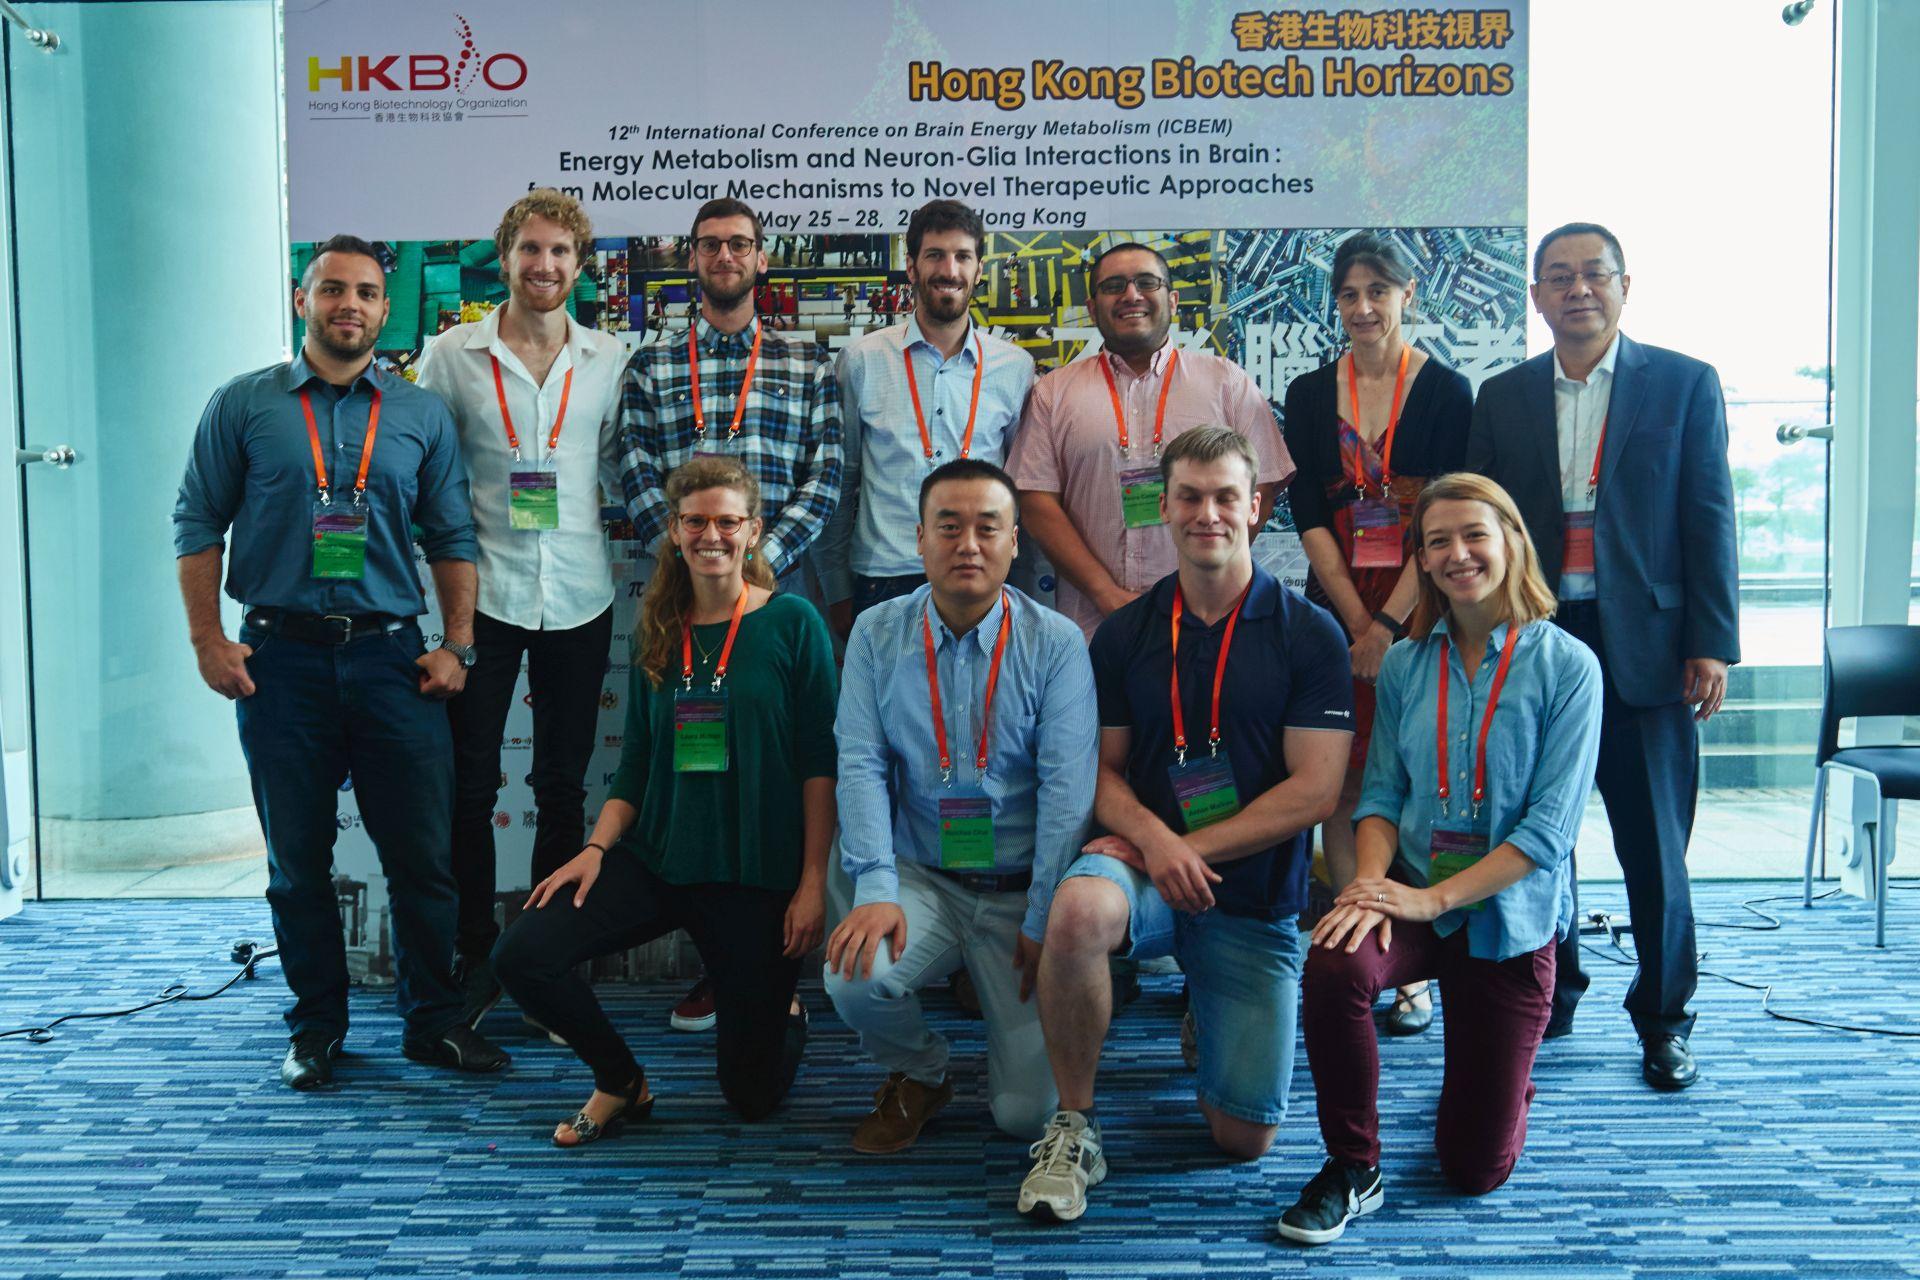 HKBIO Horizons Series: 12th International Conference on Brain Energy Metabolism